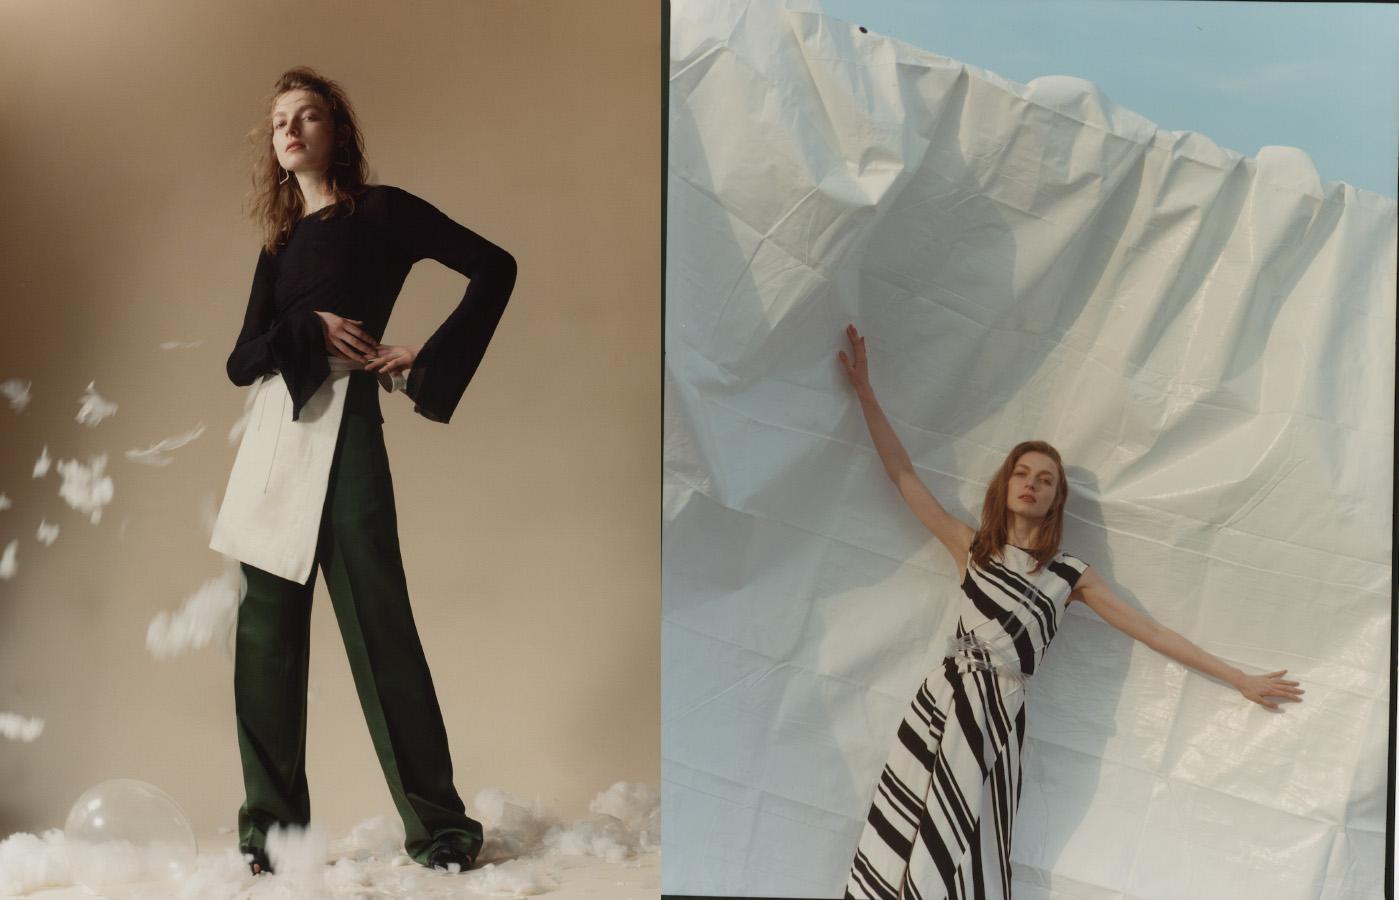 top and apron   TOMMY ZHONG   trousers   SHARON WAUCHOB   pierces   ERIKA   shoes   EUDON CHOI  . dress   DIVKA